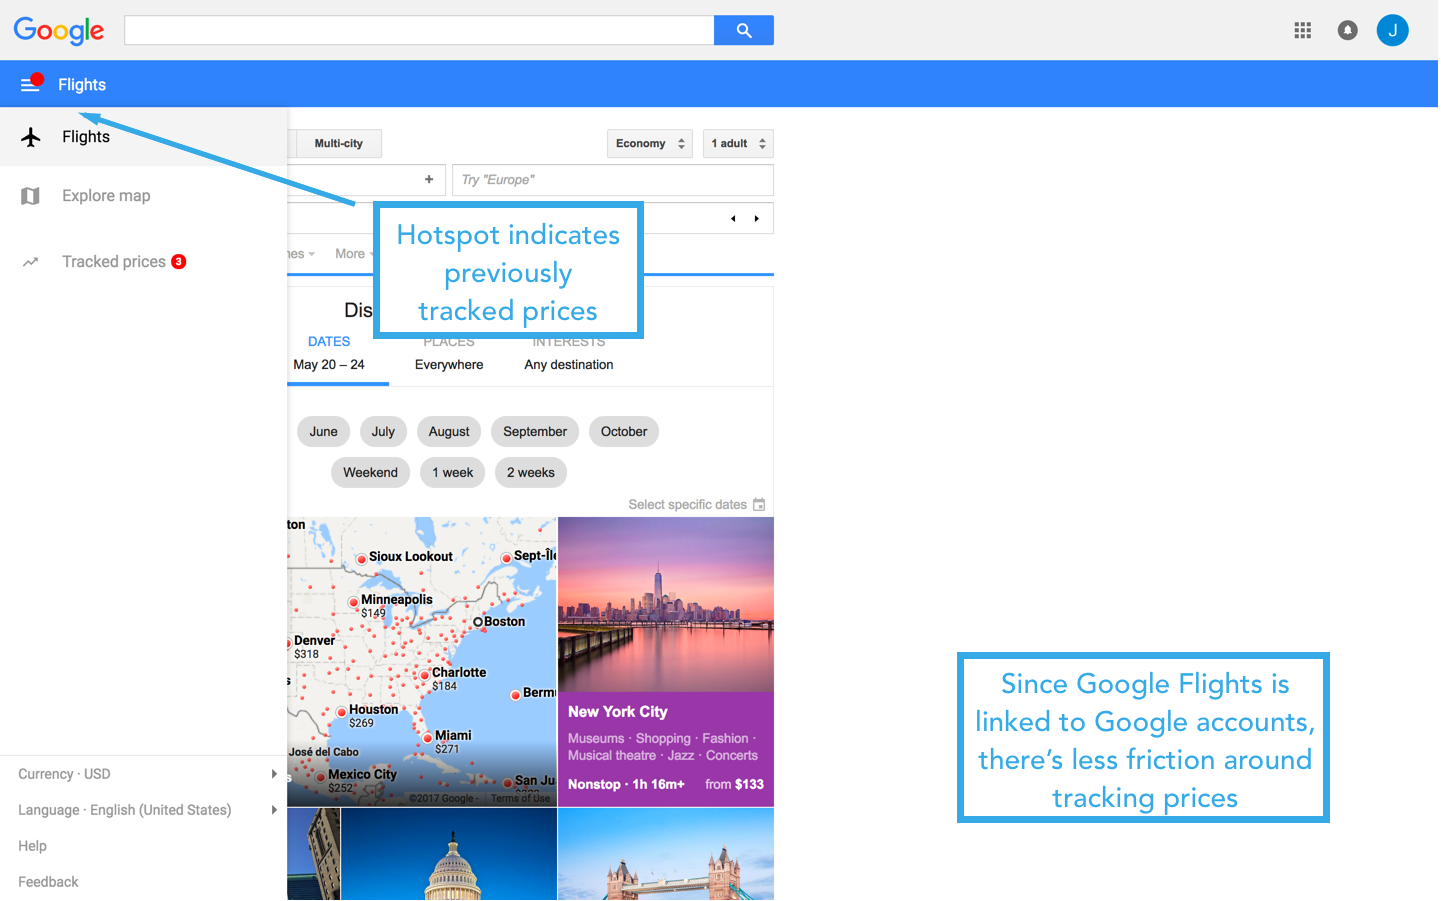 google flights homepage 2-1 hotspots